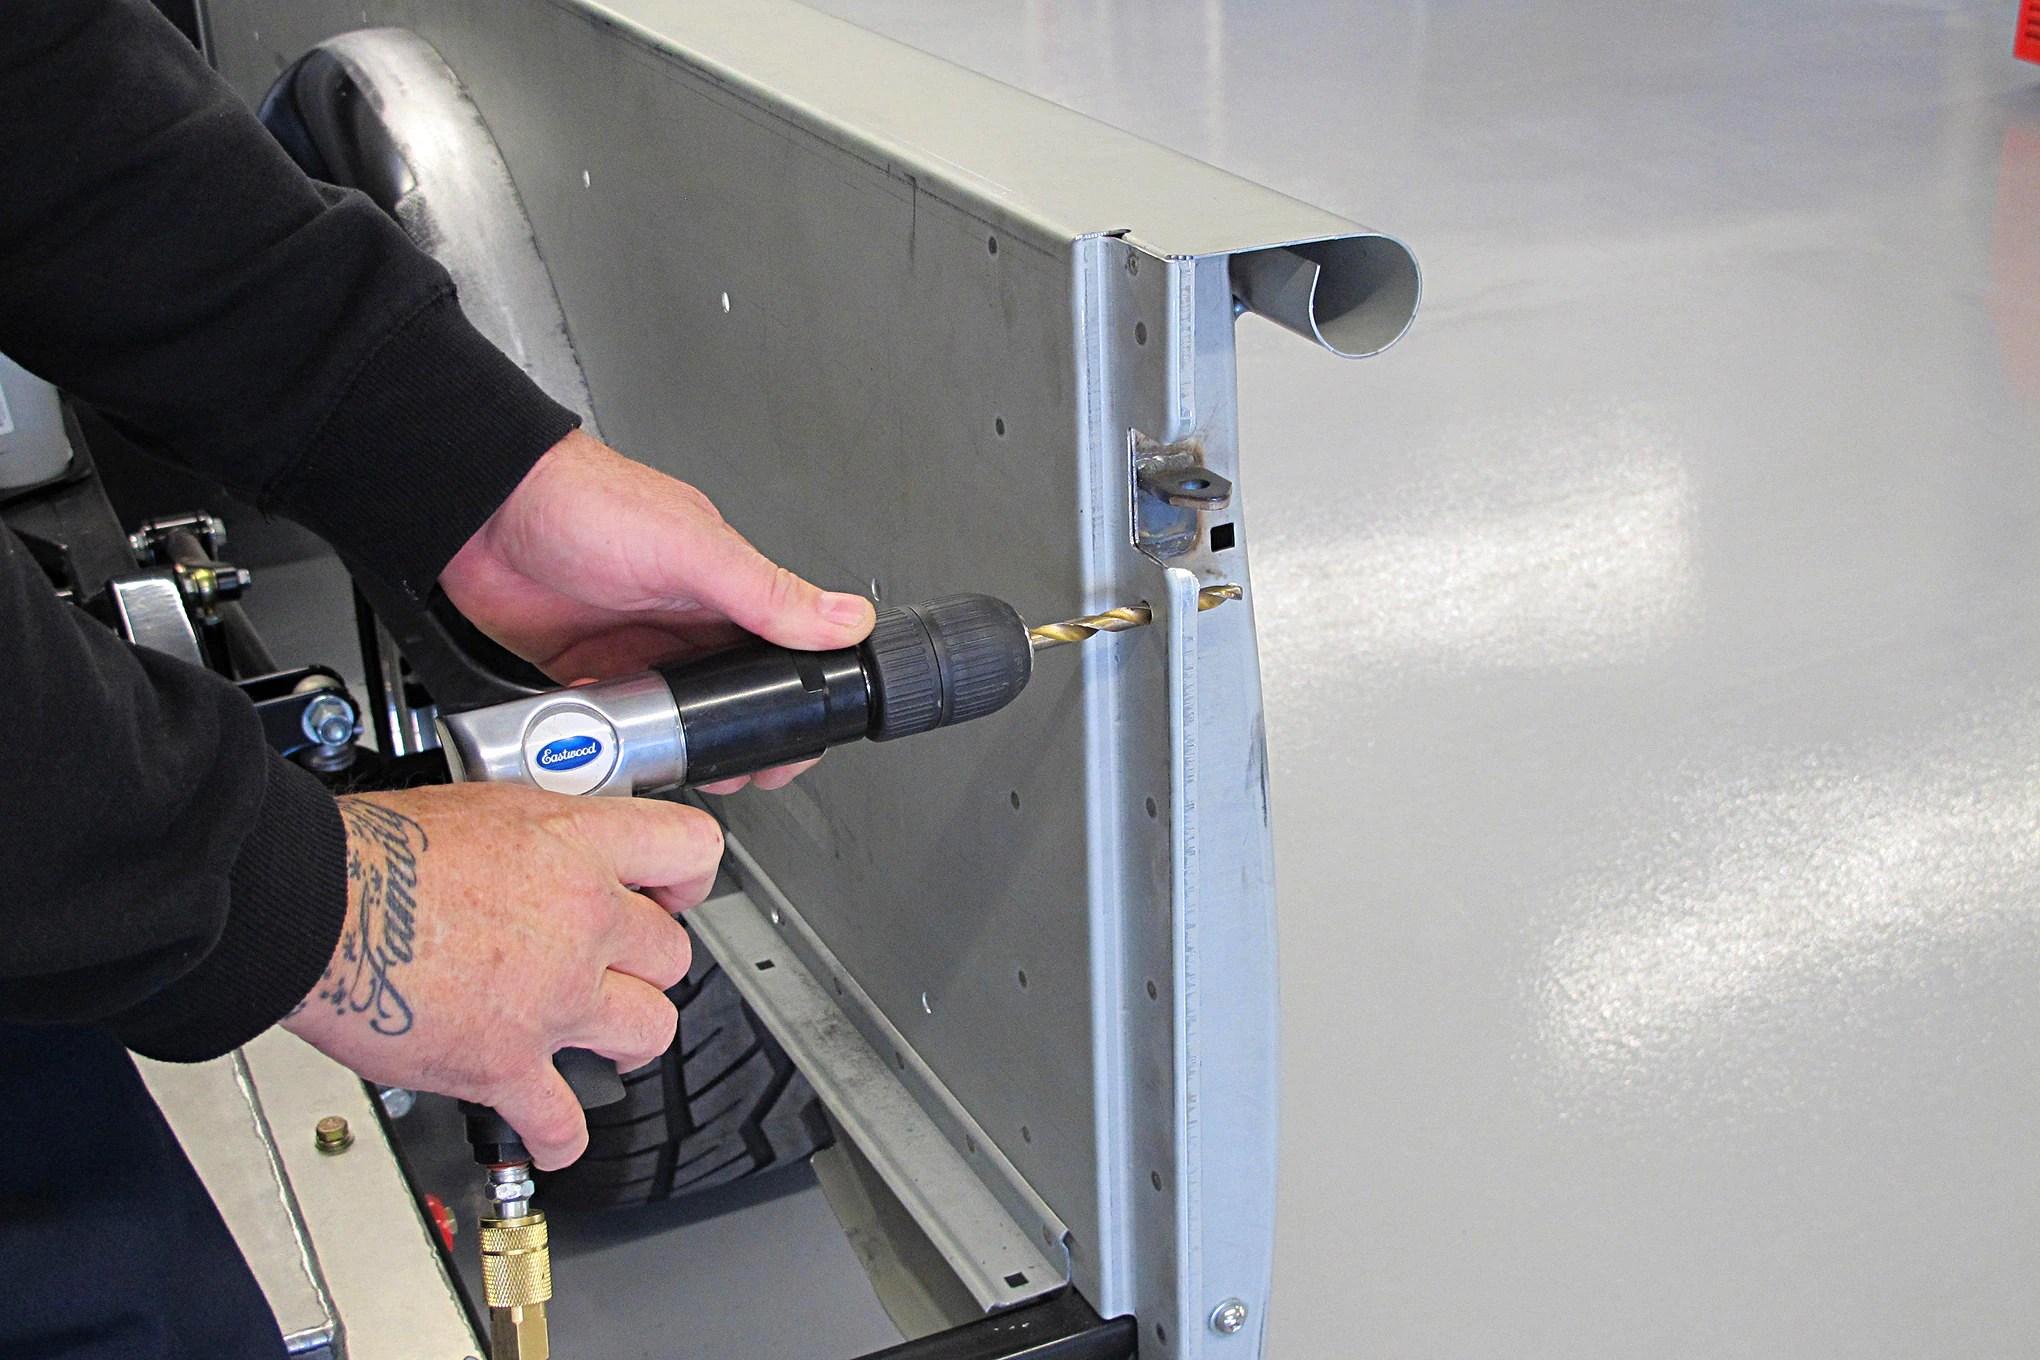 04-CLTP-170100-chevy-stepside-hidden-tailgate-latch-install.JPG